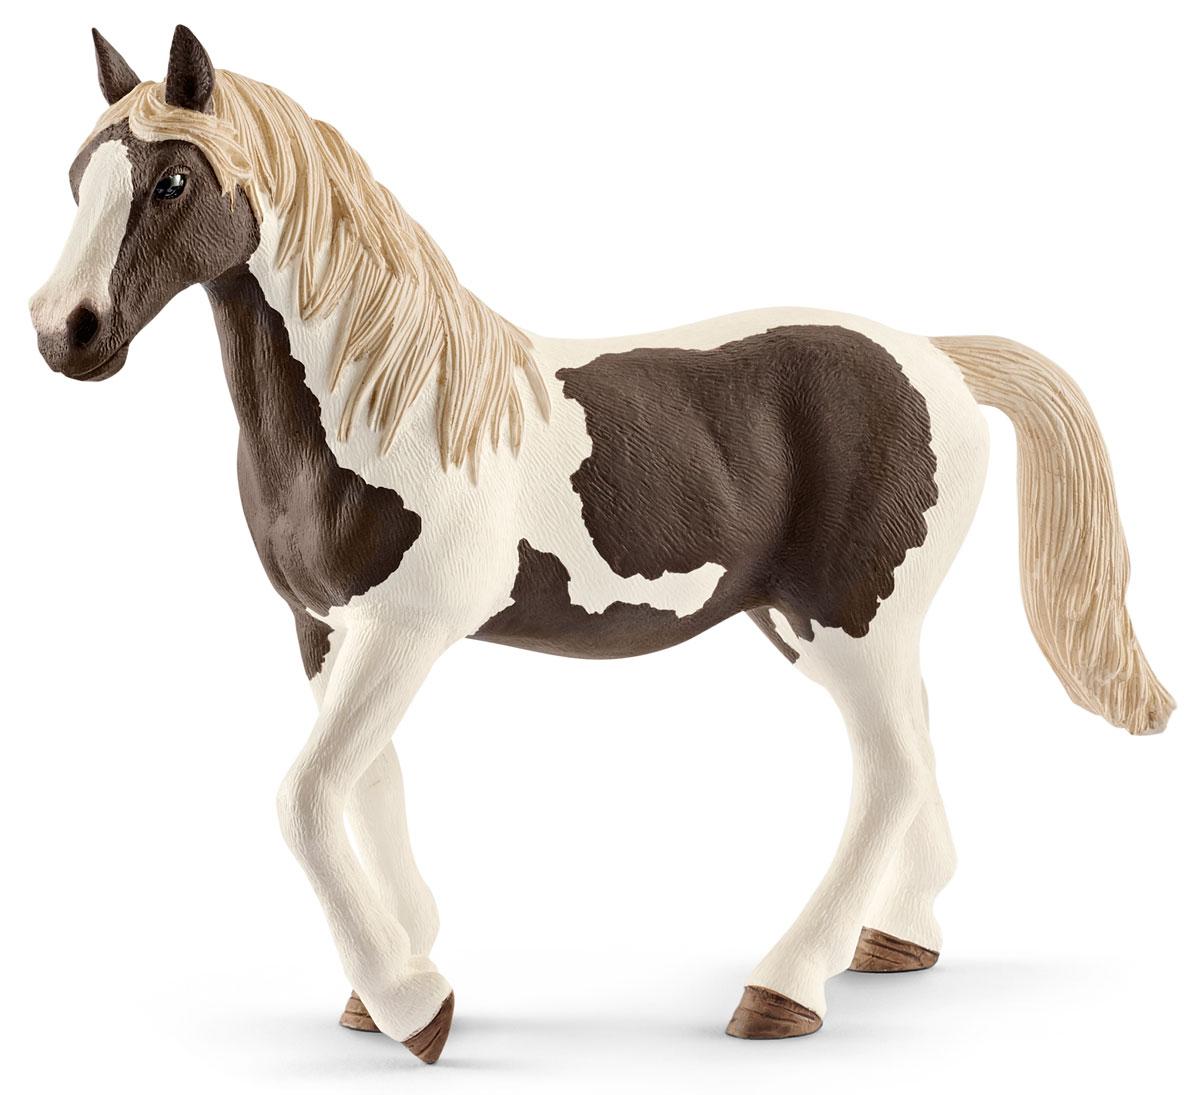 Schleich Фигурка Кобыла Пинто цвет молочный коричневый schleich фигурка кобыла пинто цвет молочный коричневый